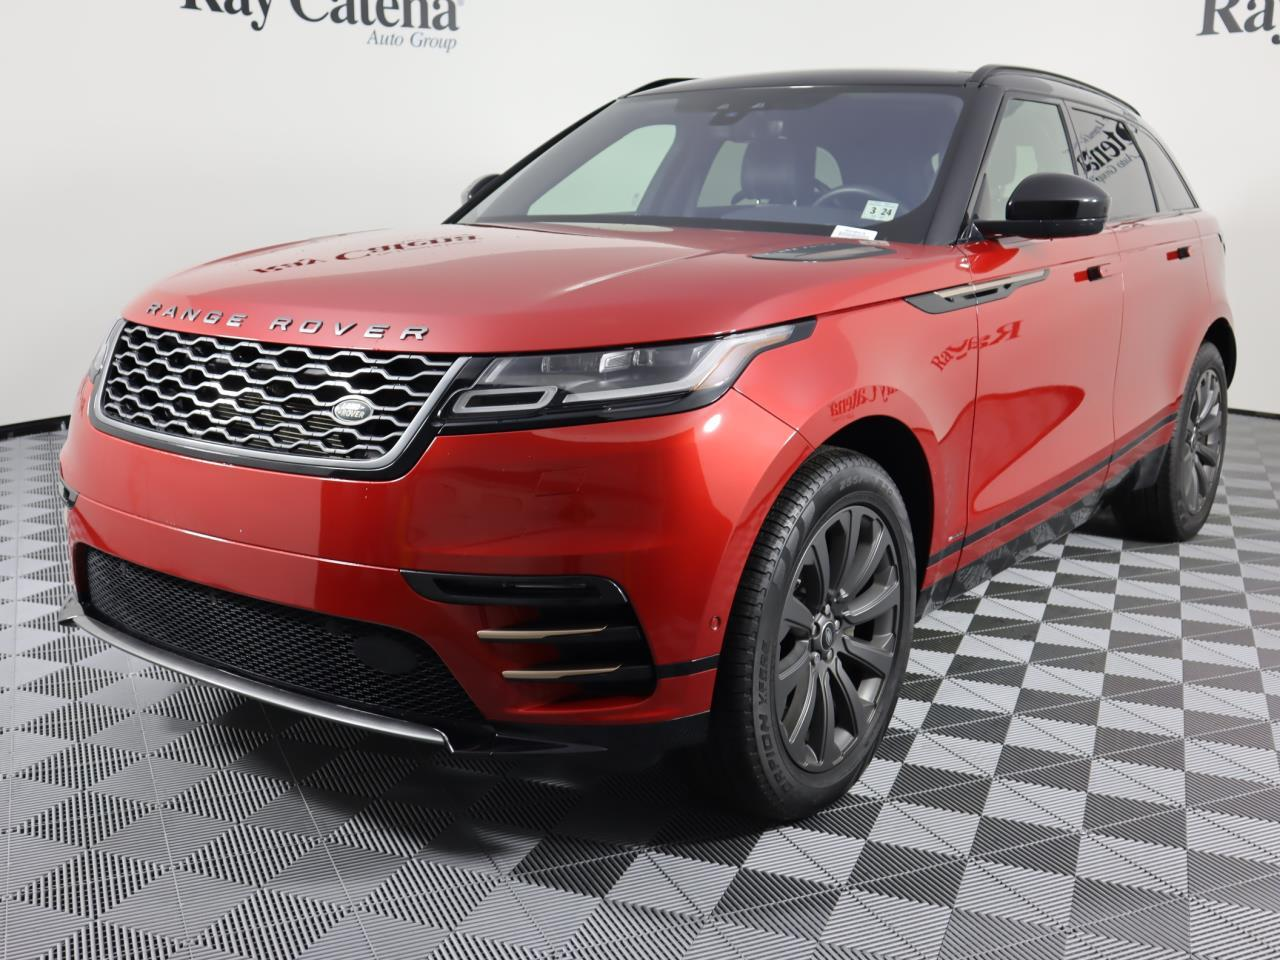 Certified Pre-Owned 2019 Land Rover Range Rover Velar P250 R-Dynamic SE